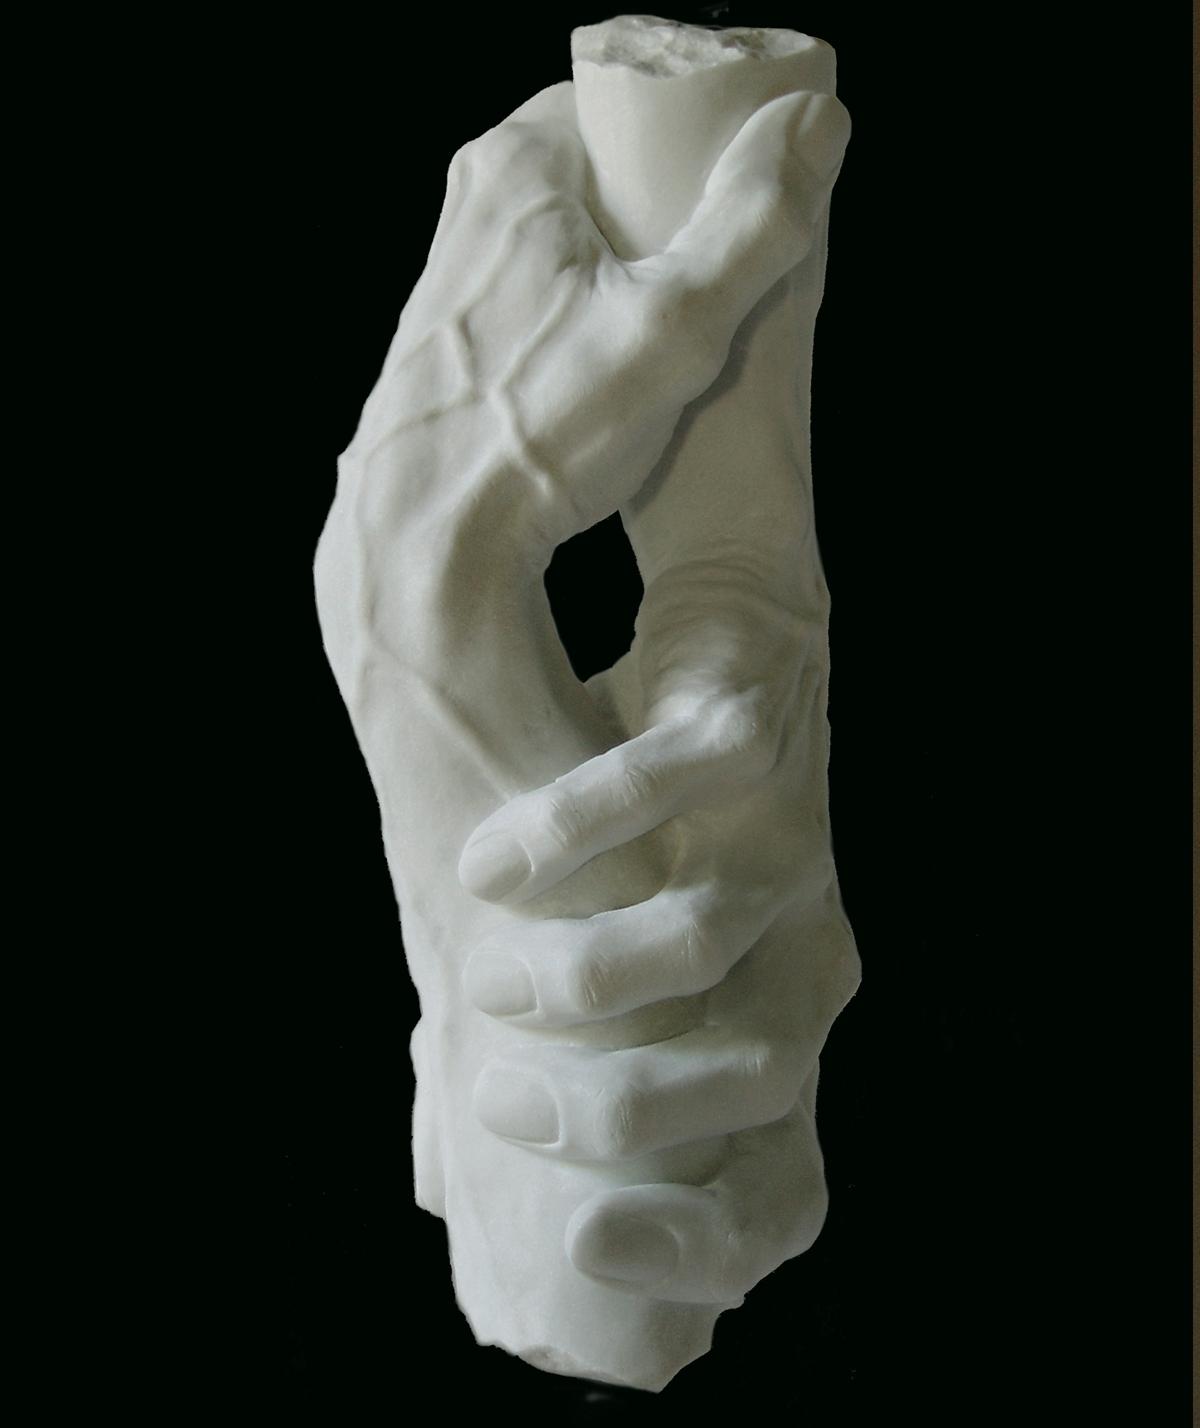 Elena-Mutinelli-3-etra-studio-tommasi